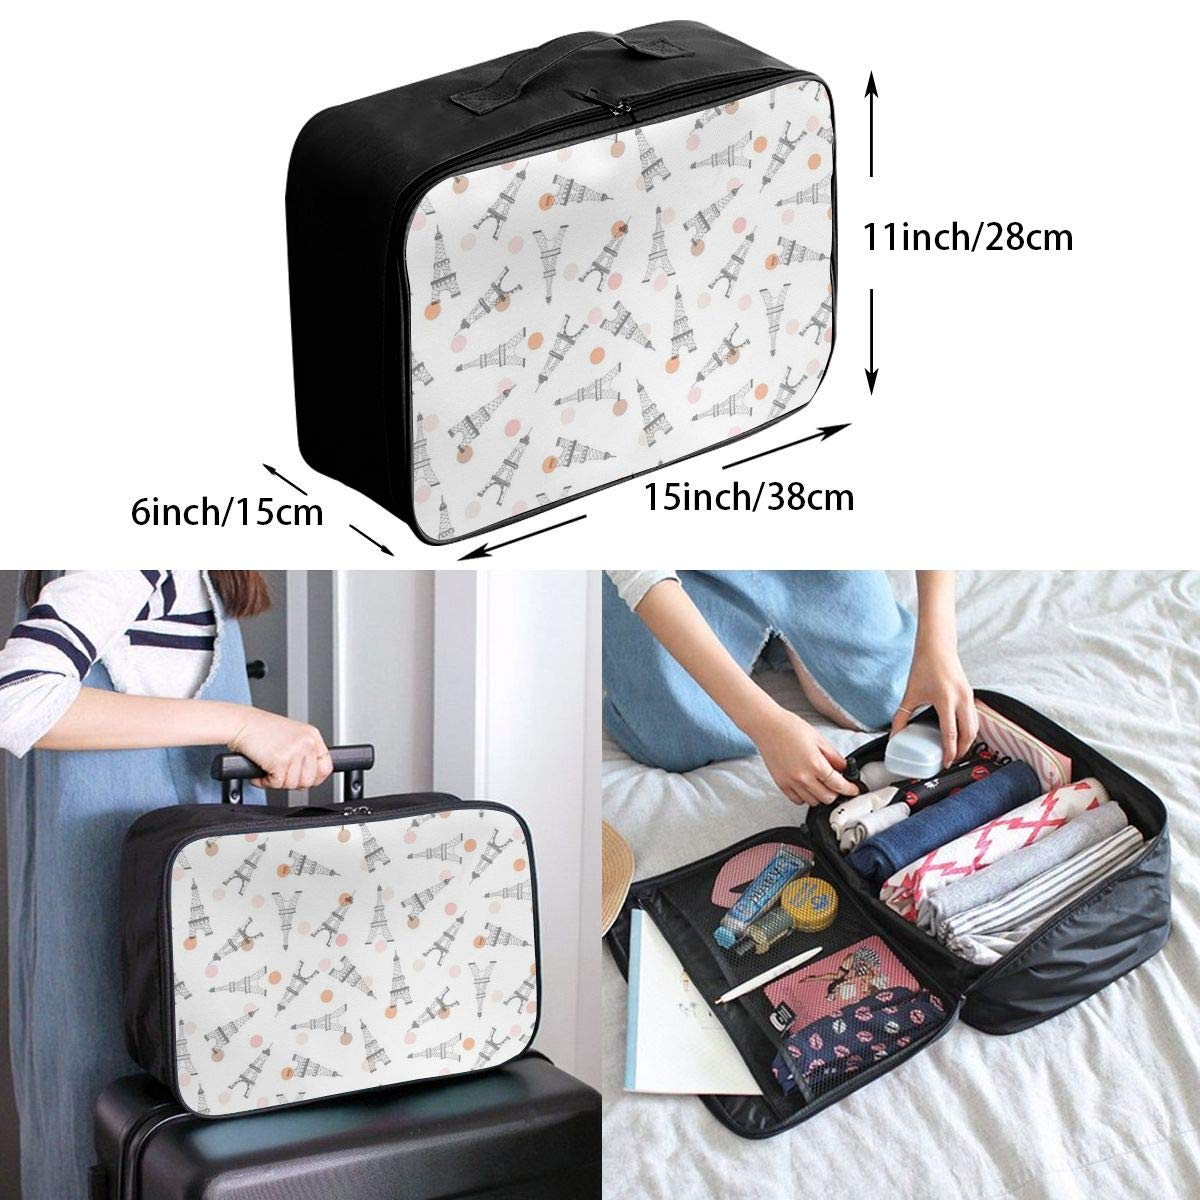 Travel Luggage Duffle Bag Lightweight Portable Handbag Eiffel Tower Pattern Large Capacity Waterproof Foldable Storage Tote